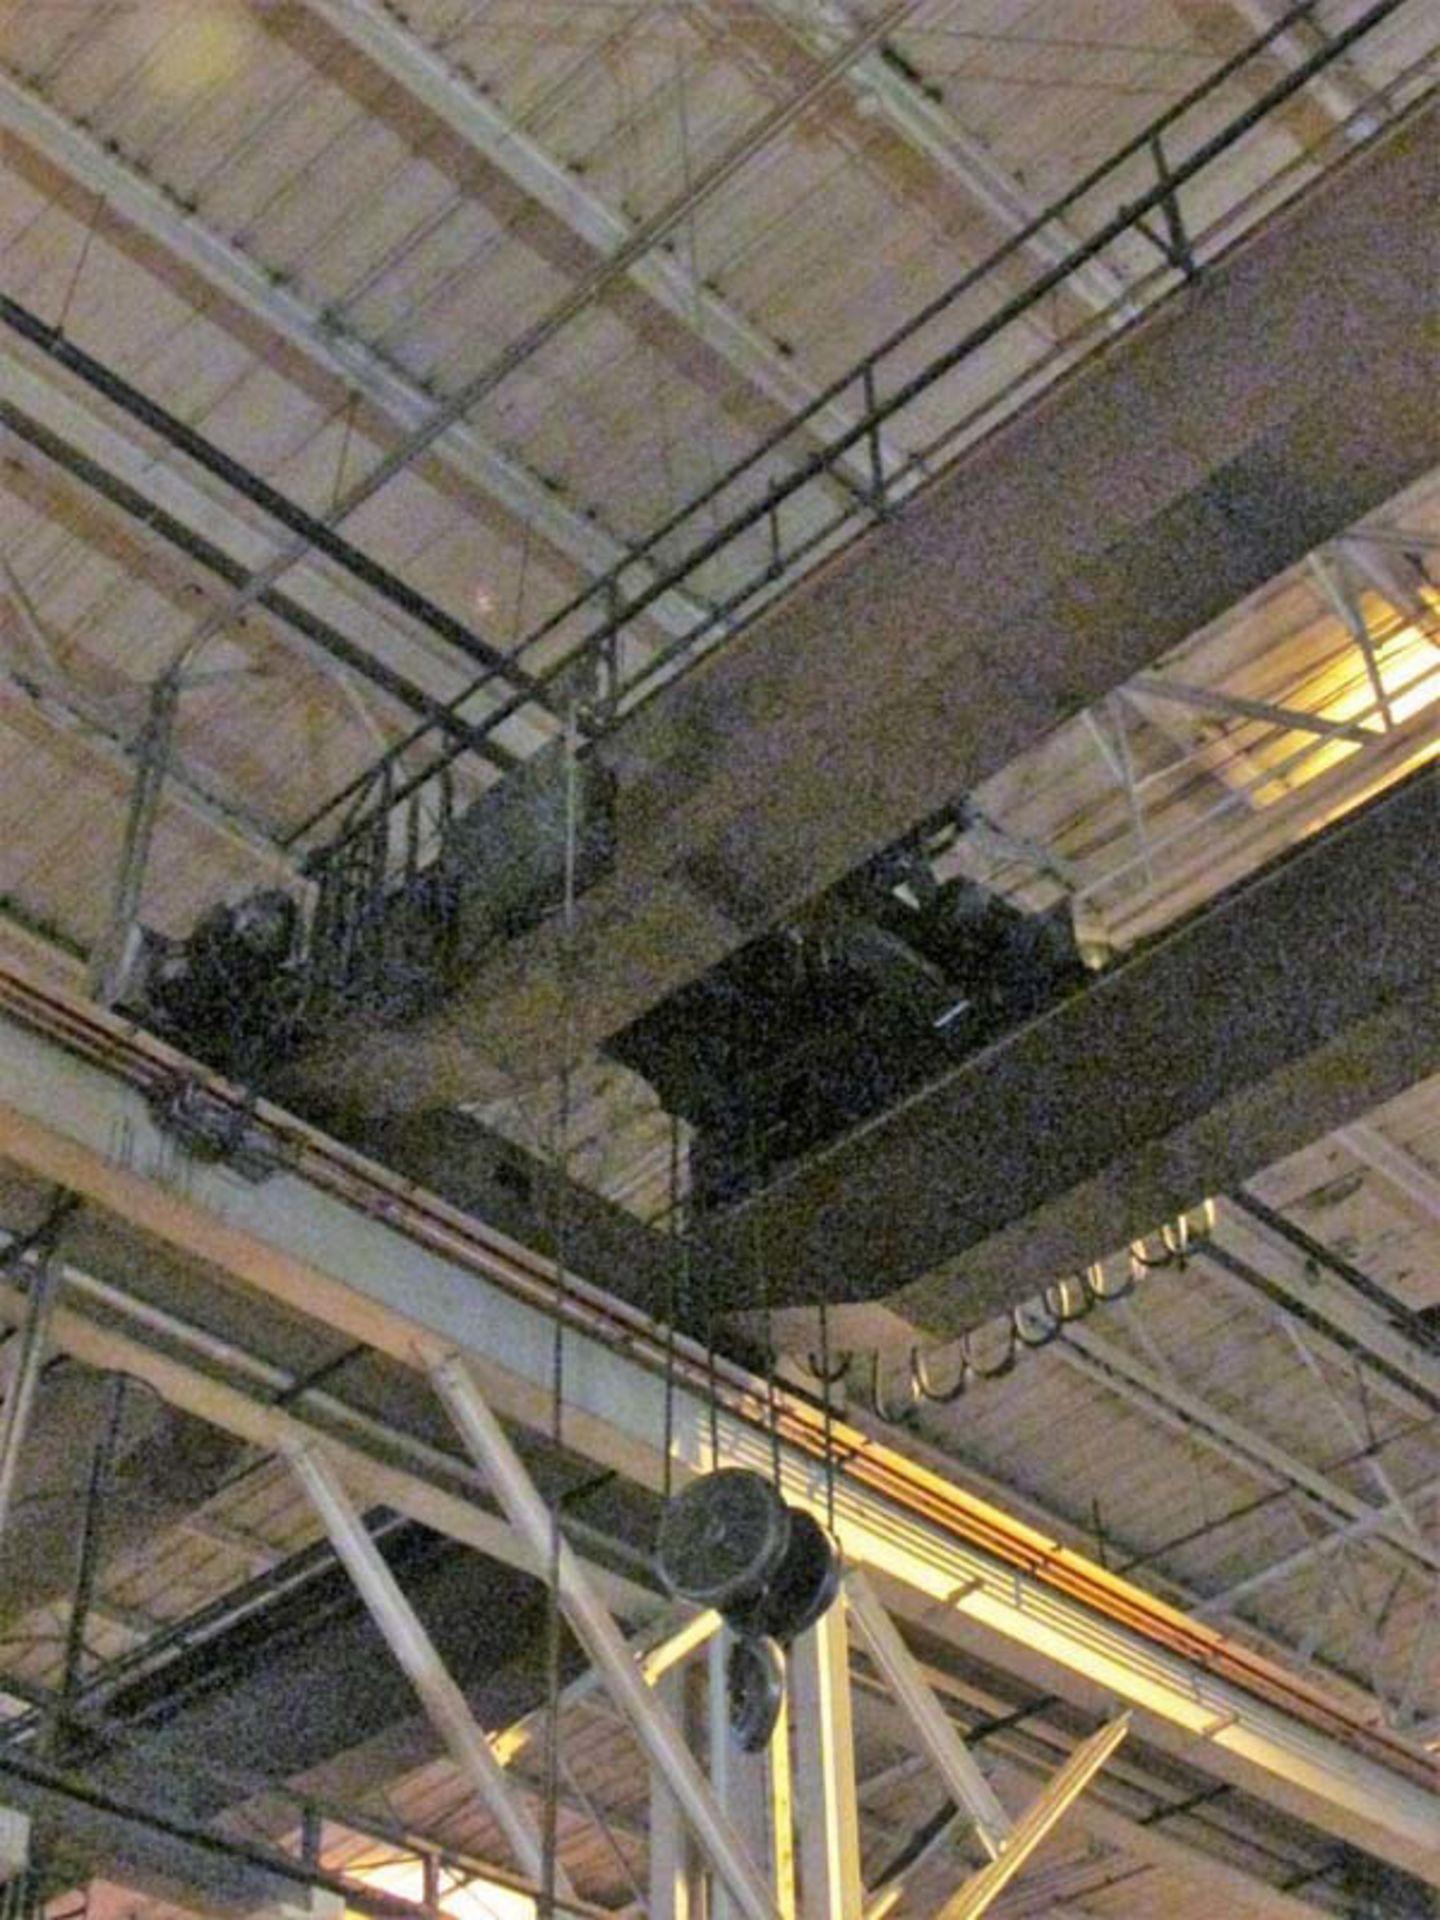 Demag Top Riding Double Girder Bridge Crane | 25-Ton x 50', Mdl: N/A, S/N: 75066 - 8398P - Image 6 of 10